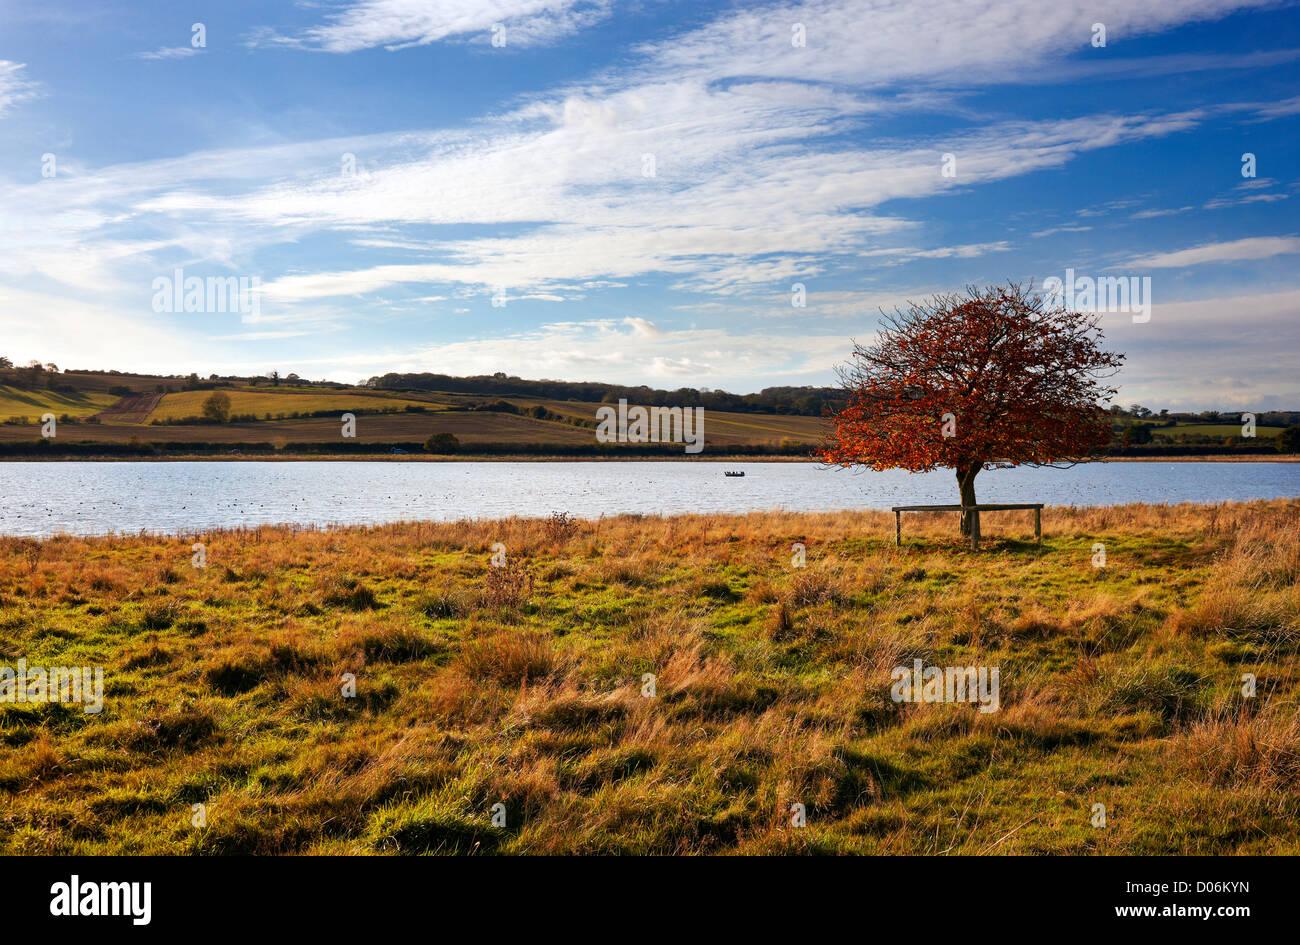 Eyebrook reservoir on the Leicestershire Rutland border, UK - Stock Image